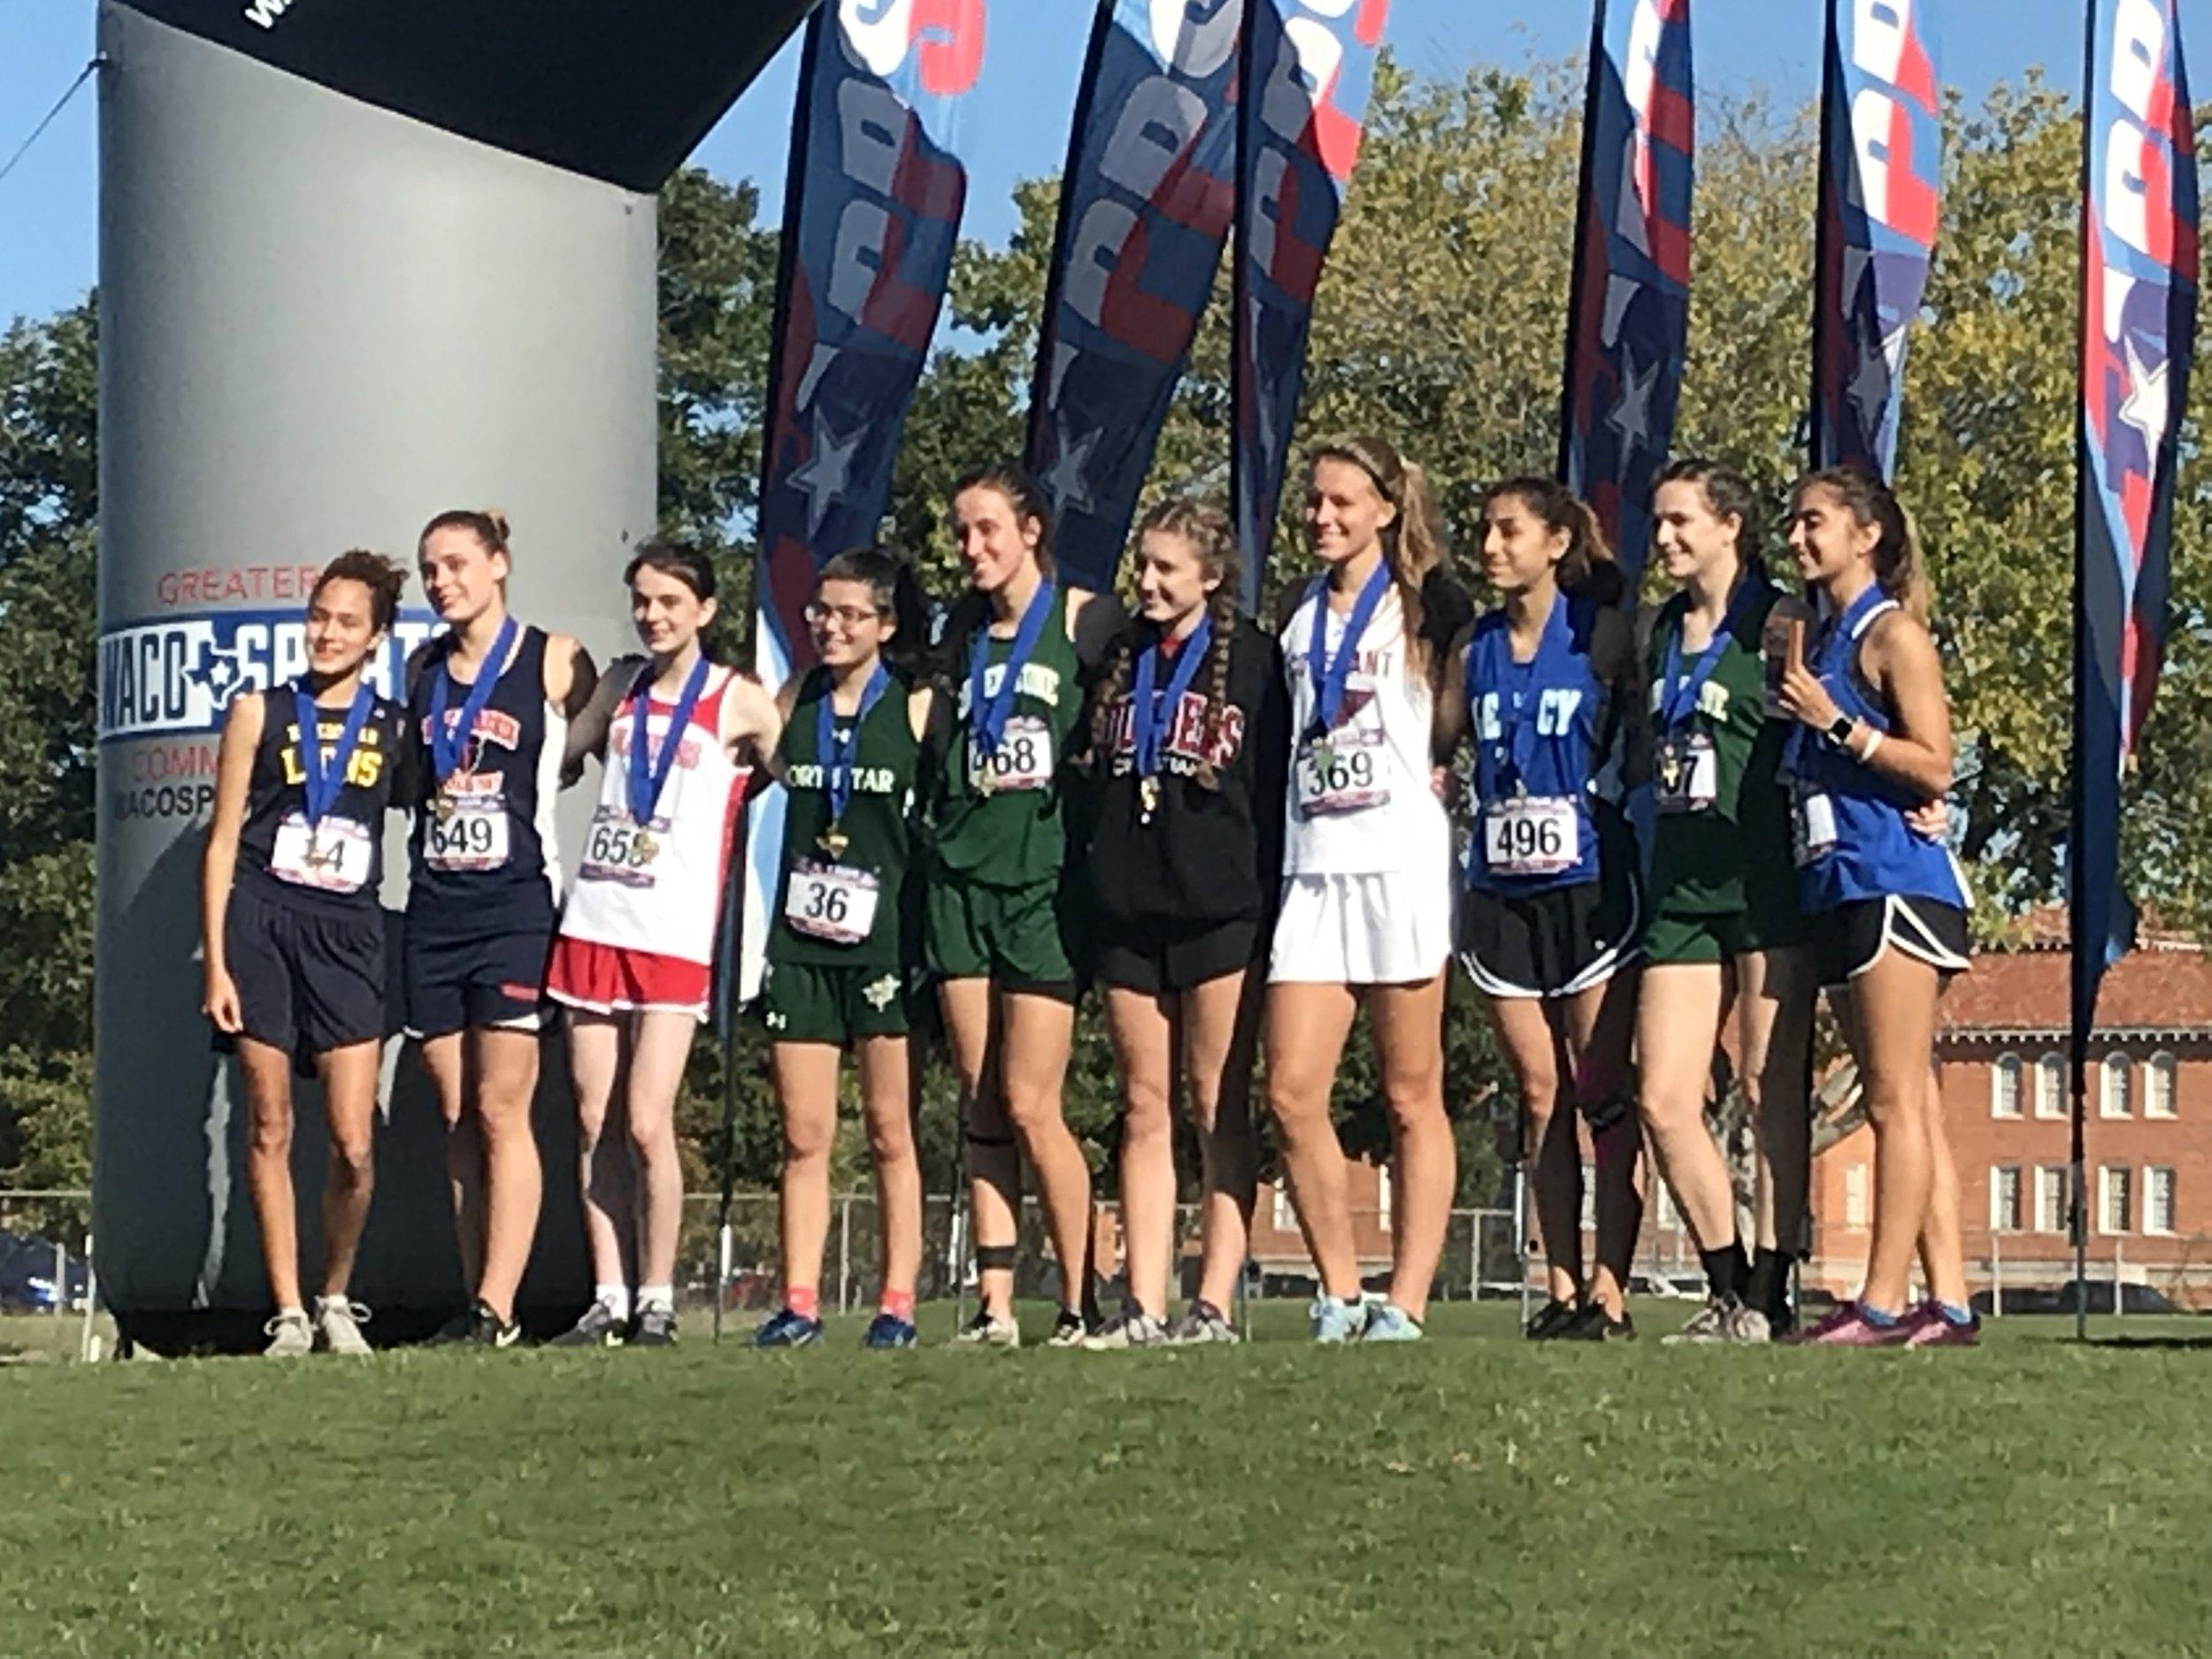 Cross-Country-Track-Team-Sierra-Jackson-Christ-Academy-wichita-falls-tx.jpg